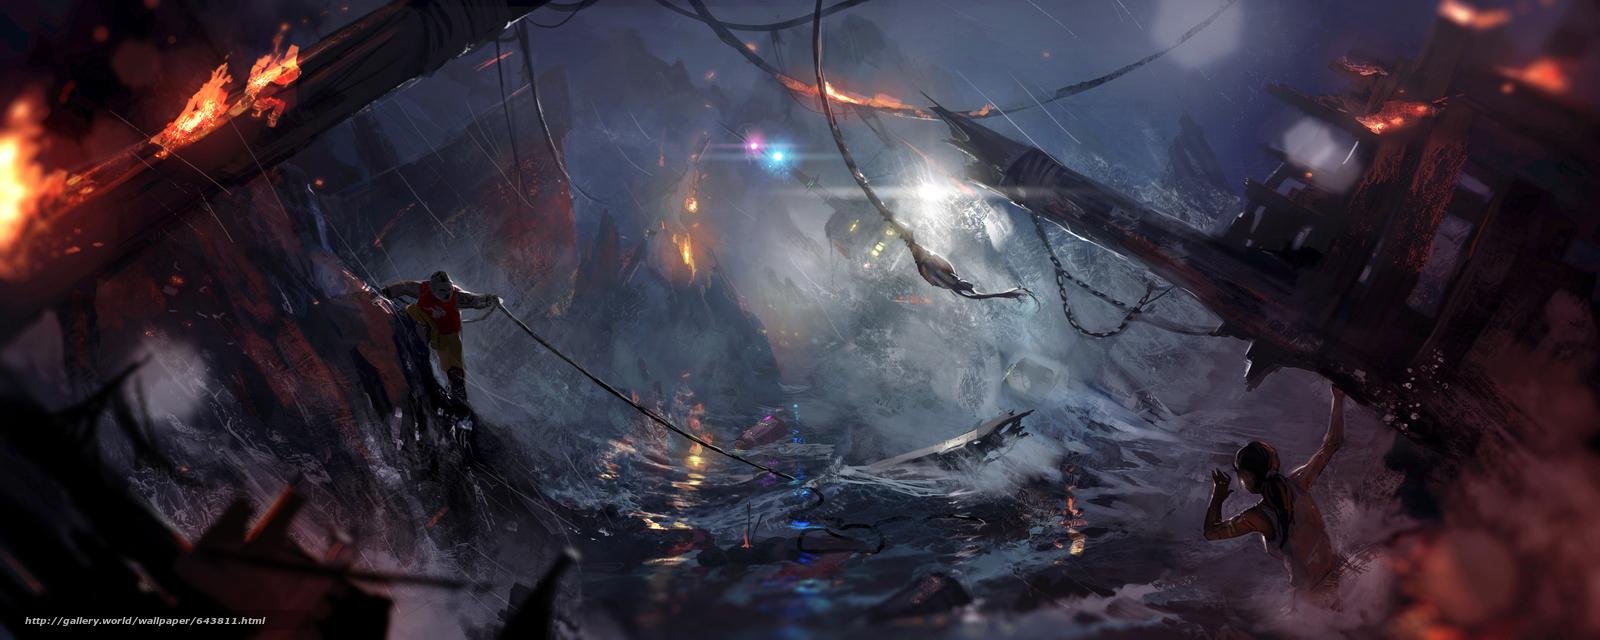 Tomb Raider, Lara Croft, shipwreck, Art